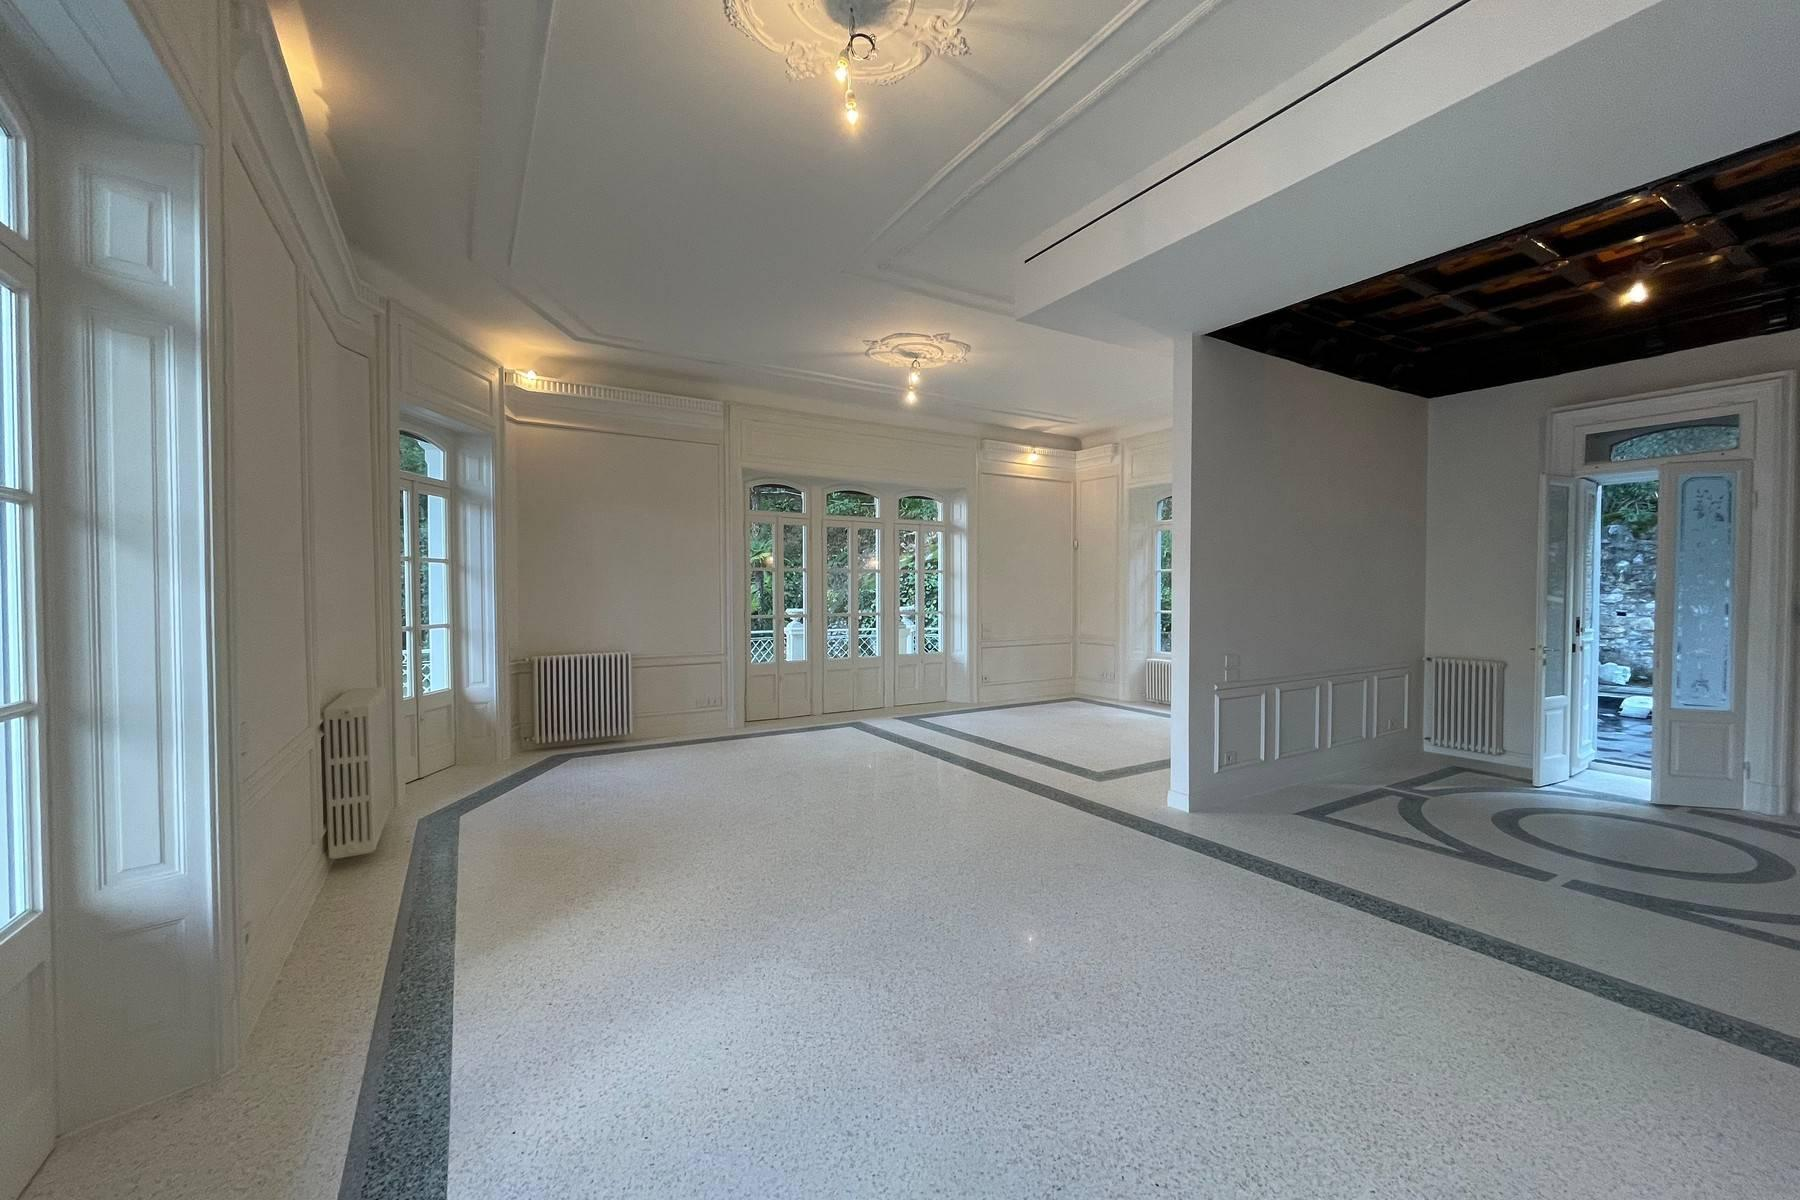 Maestosa Villa in stile Liberty - 7